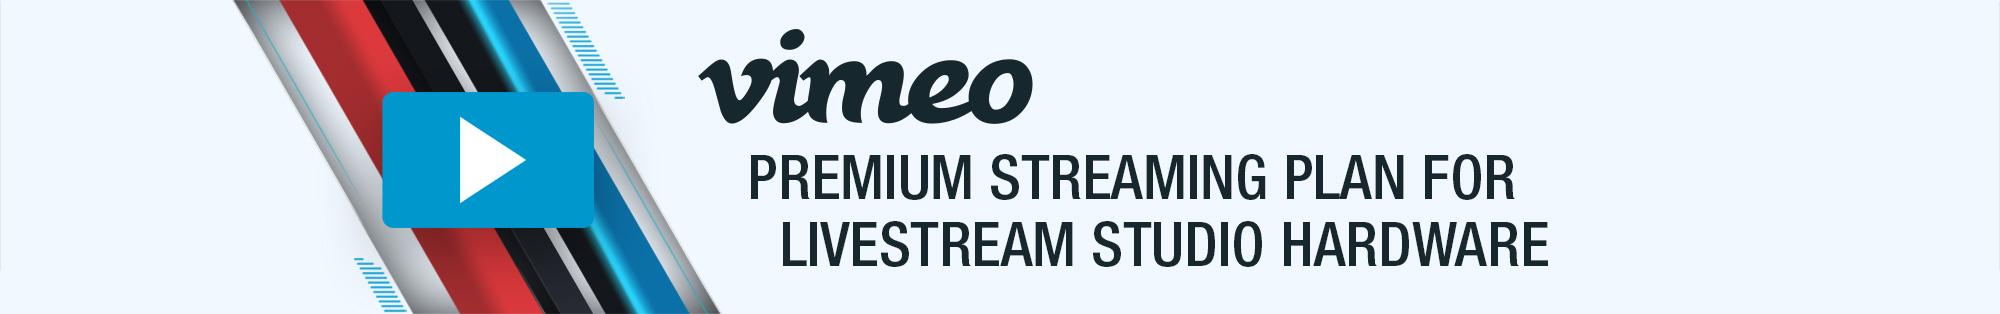 vimeo premium streaming plan for livestream studio hardware